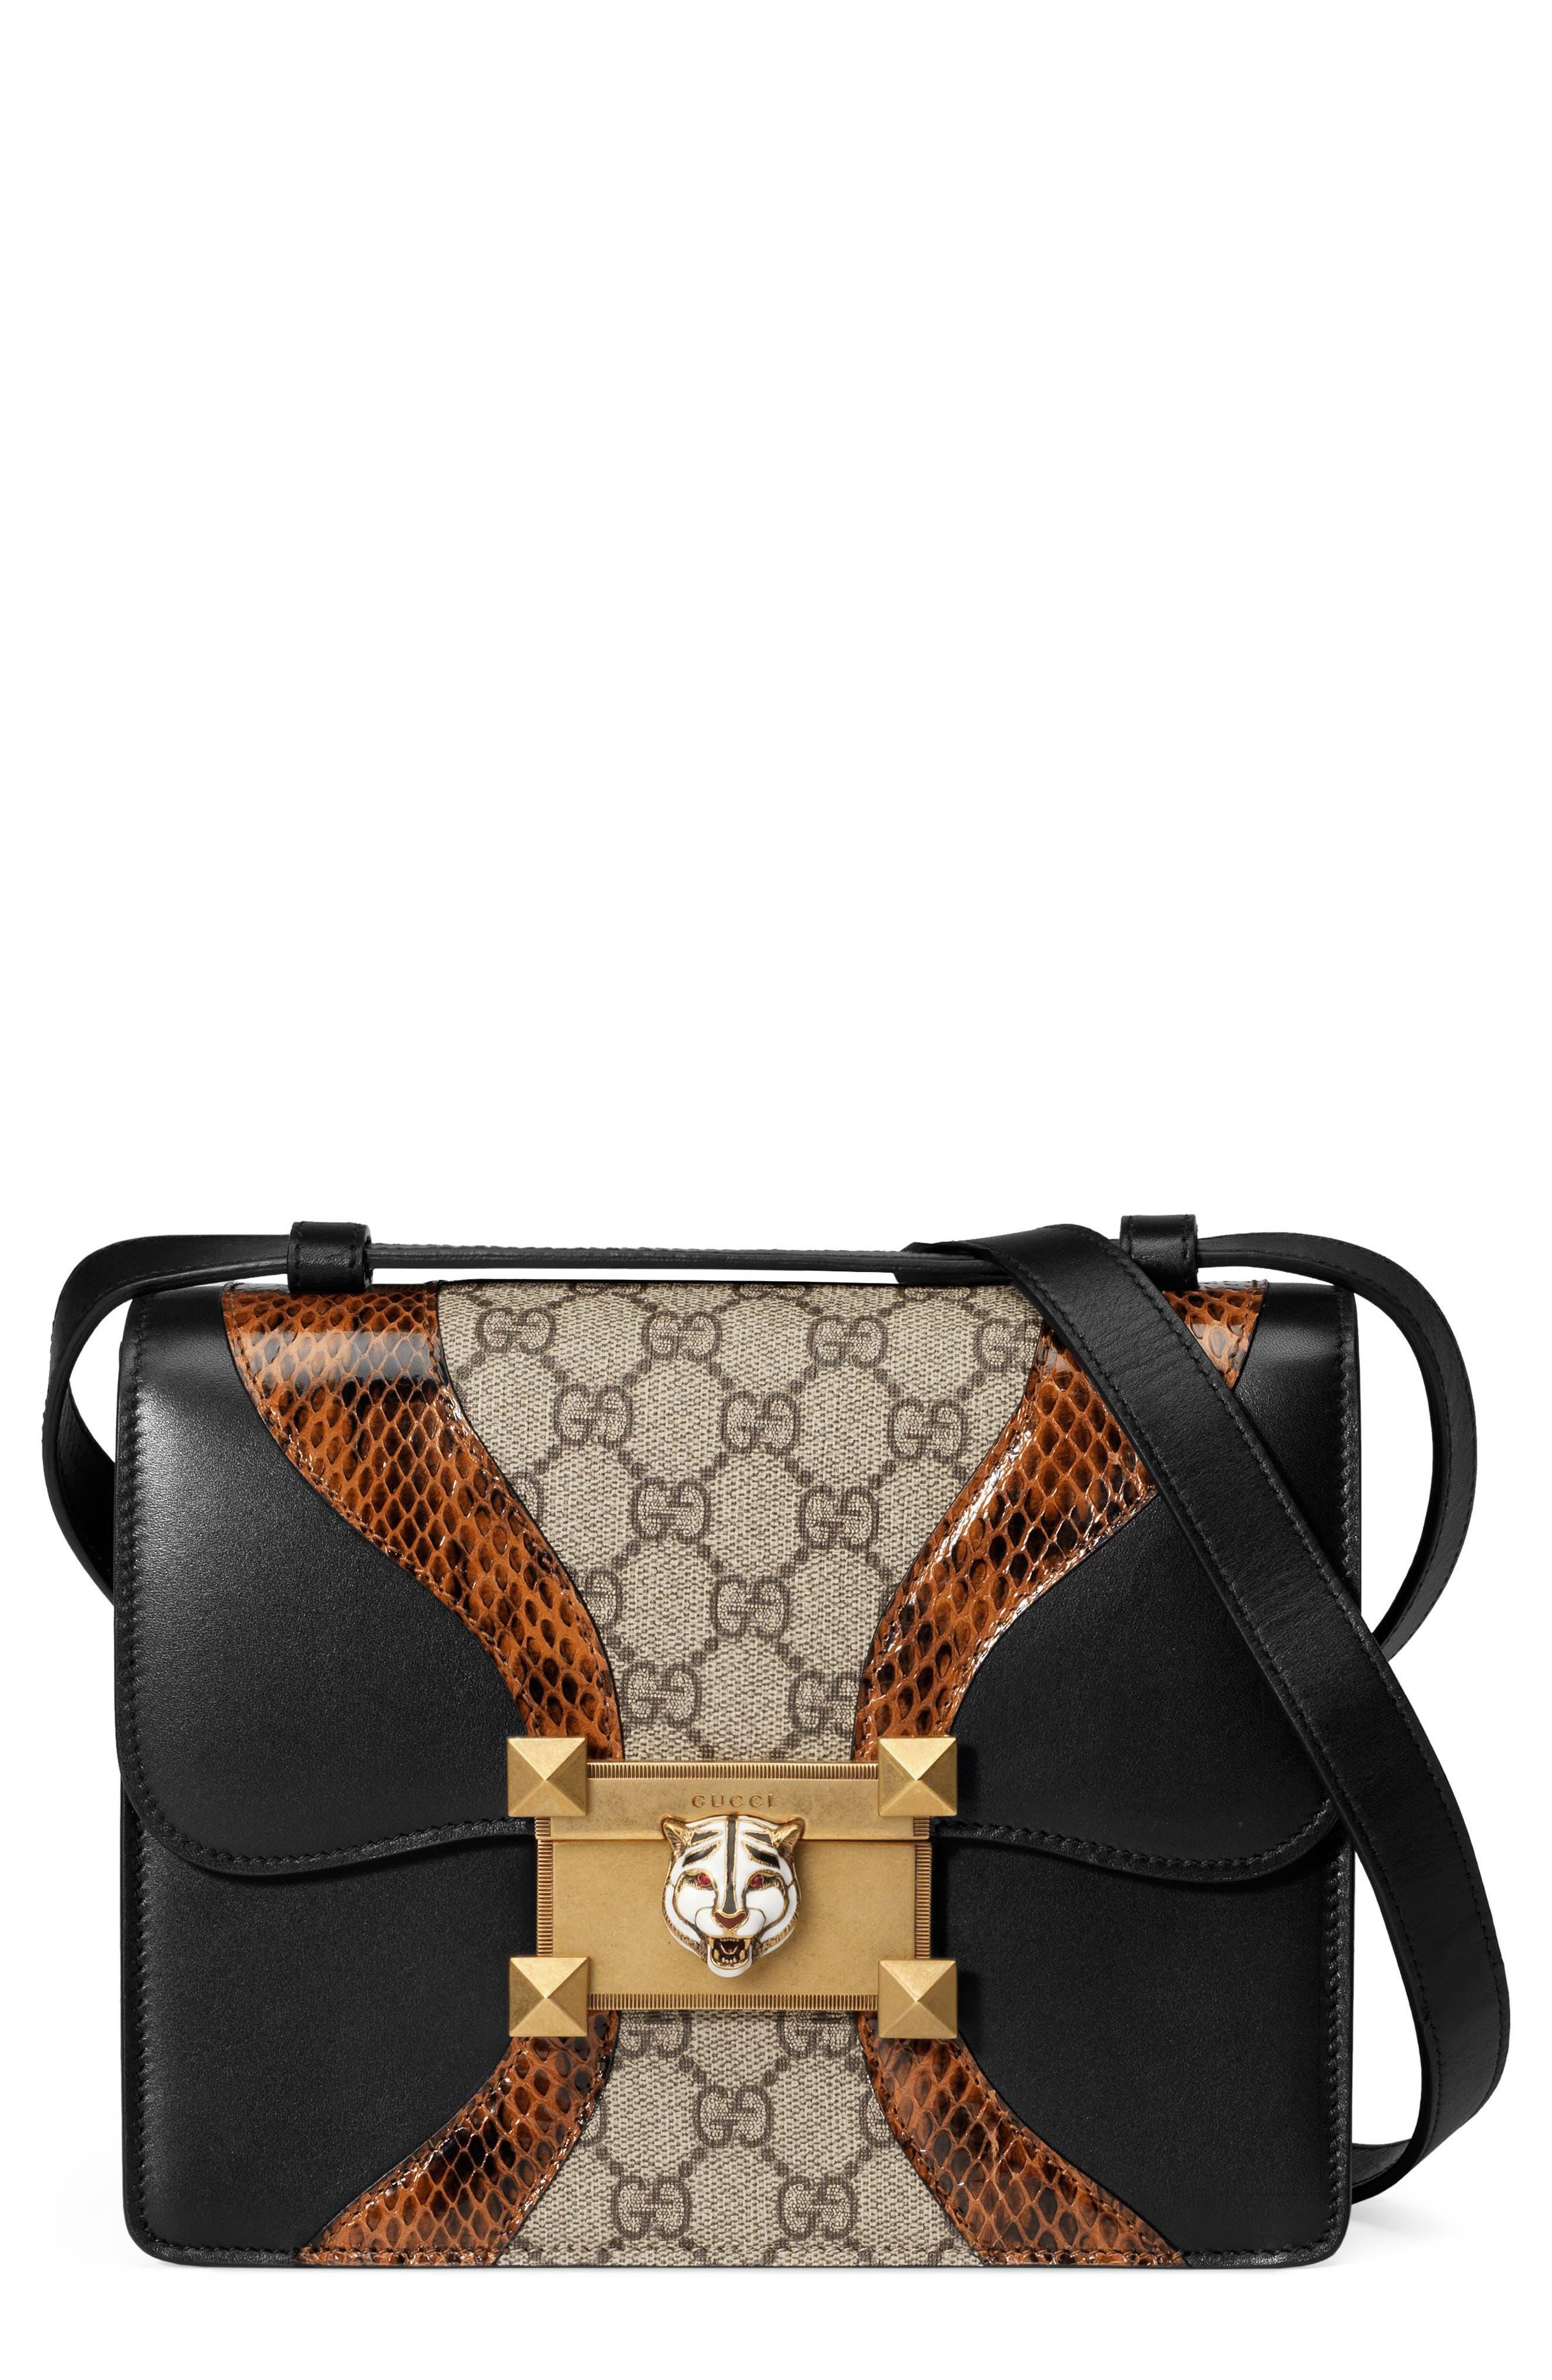 Osiride Genuine Snakeskin & GG Supreme Shoulder Bag,                         Main,                         color, Nero/ Cuir/ Beige Ebony/ Ruby